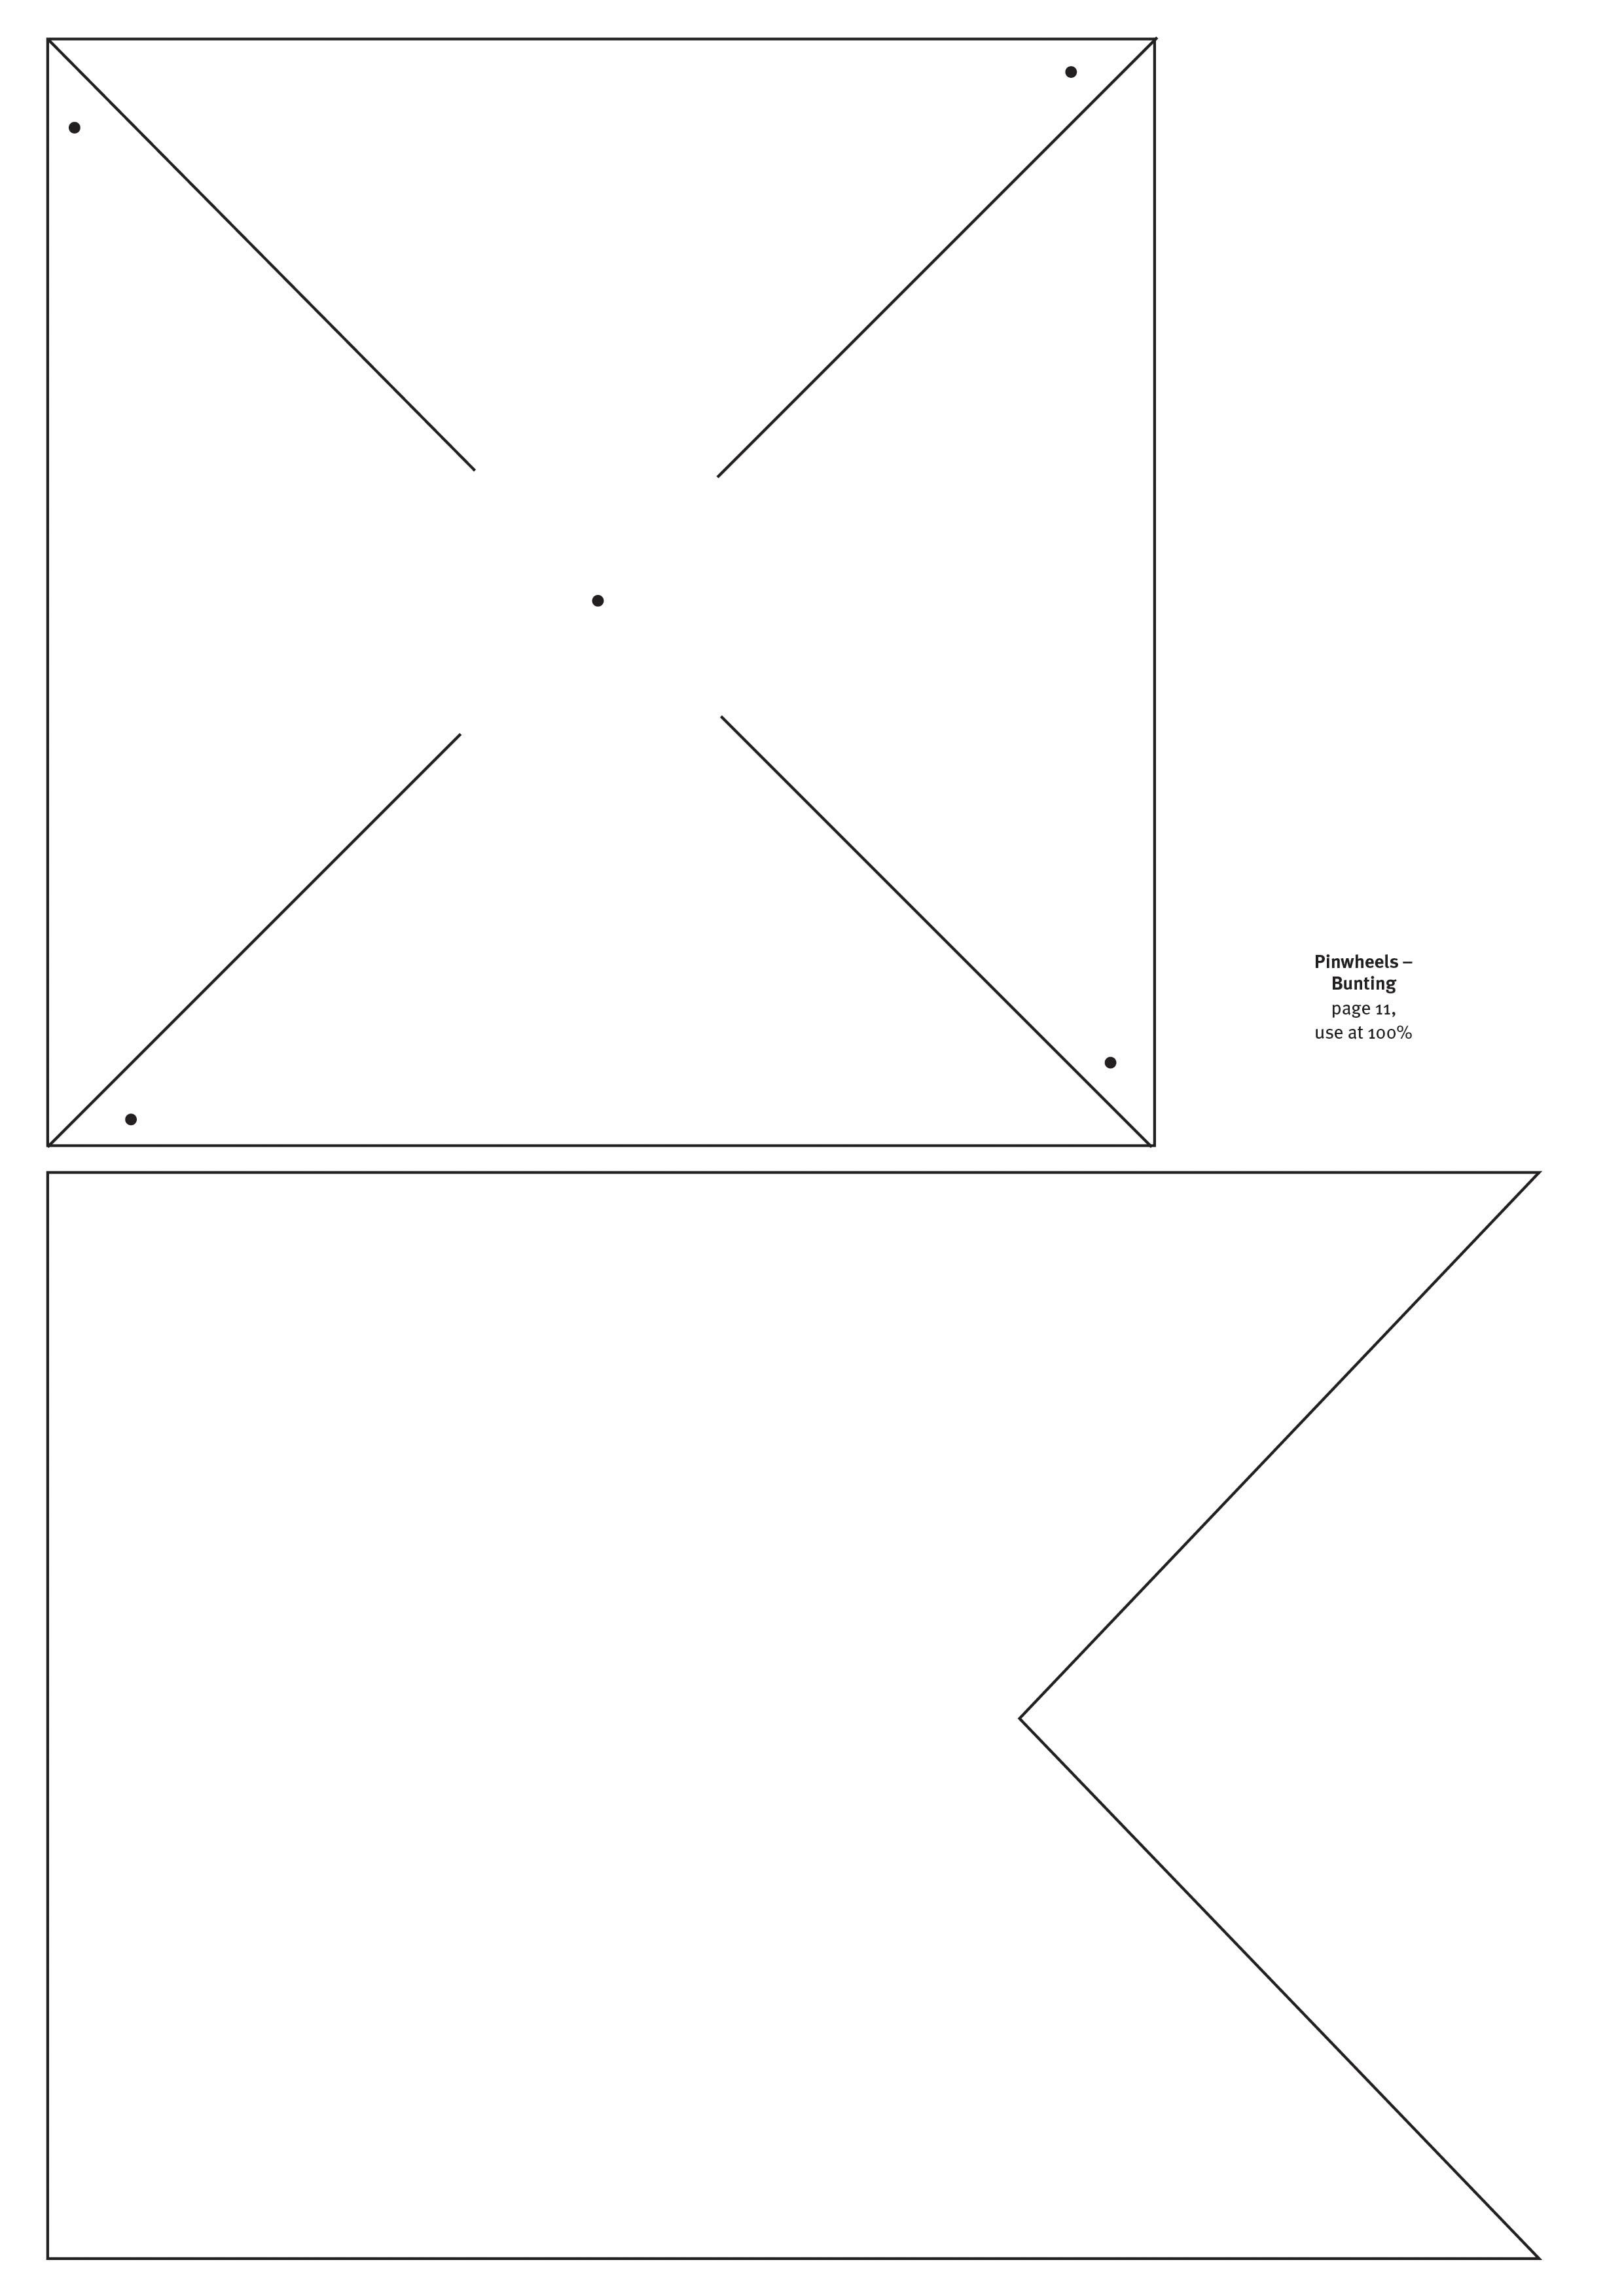 Vistoso Plantilla Pinwheel Imprimible Molde - Colección De ...